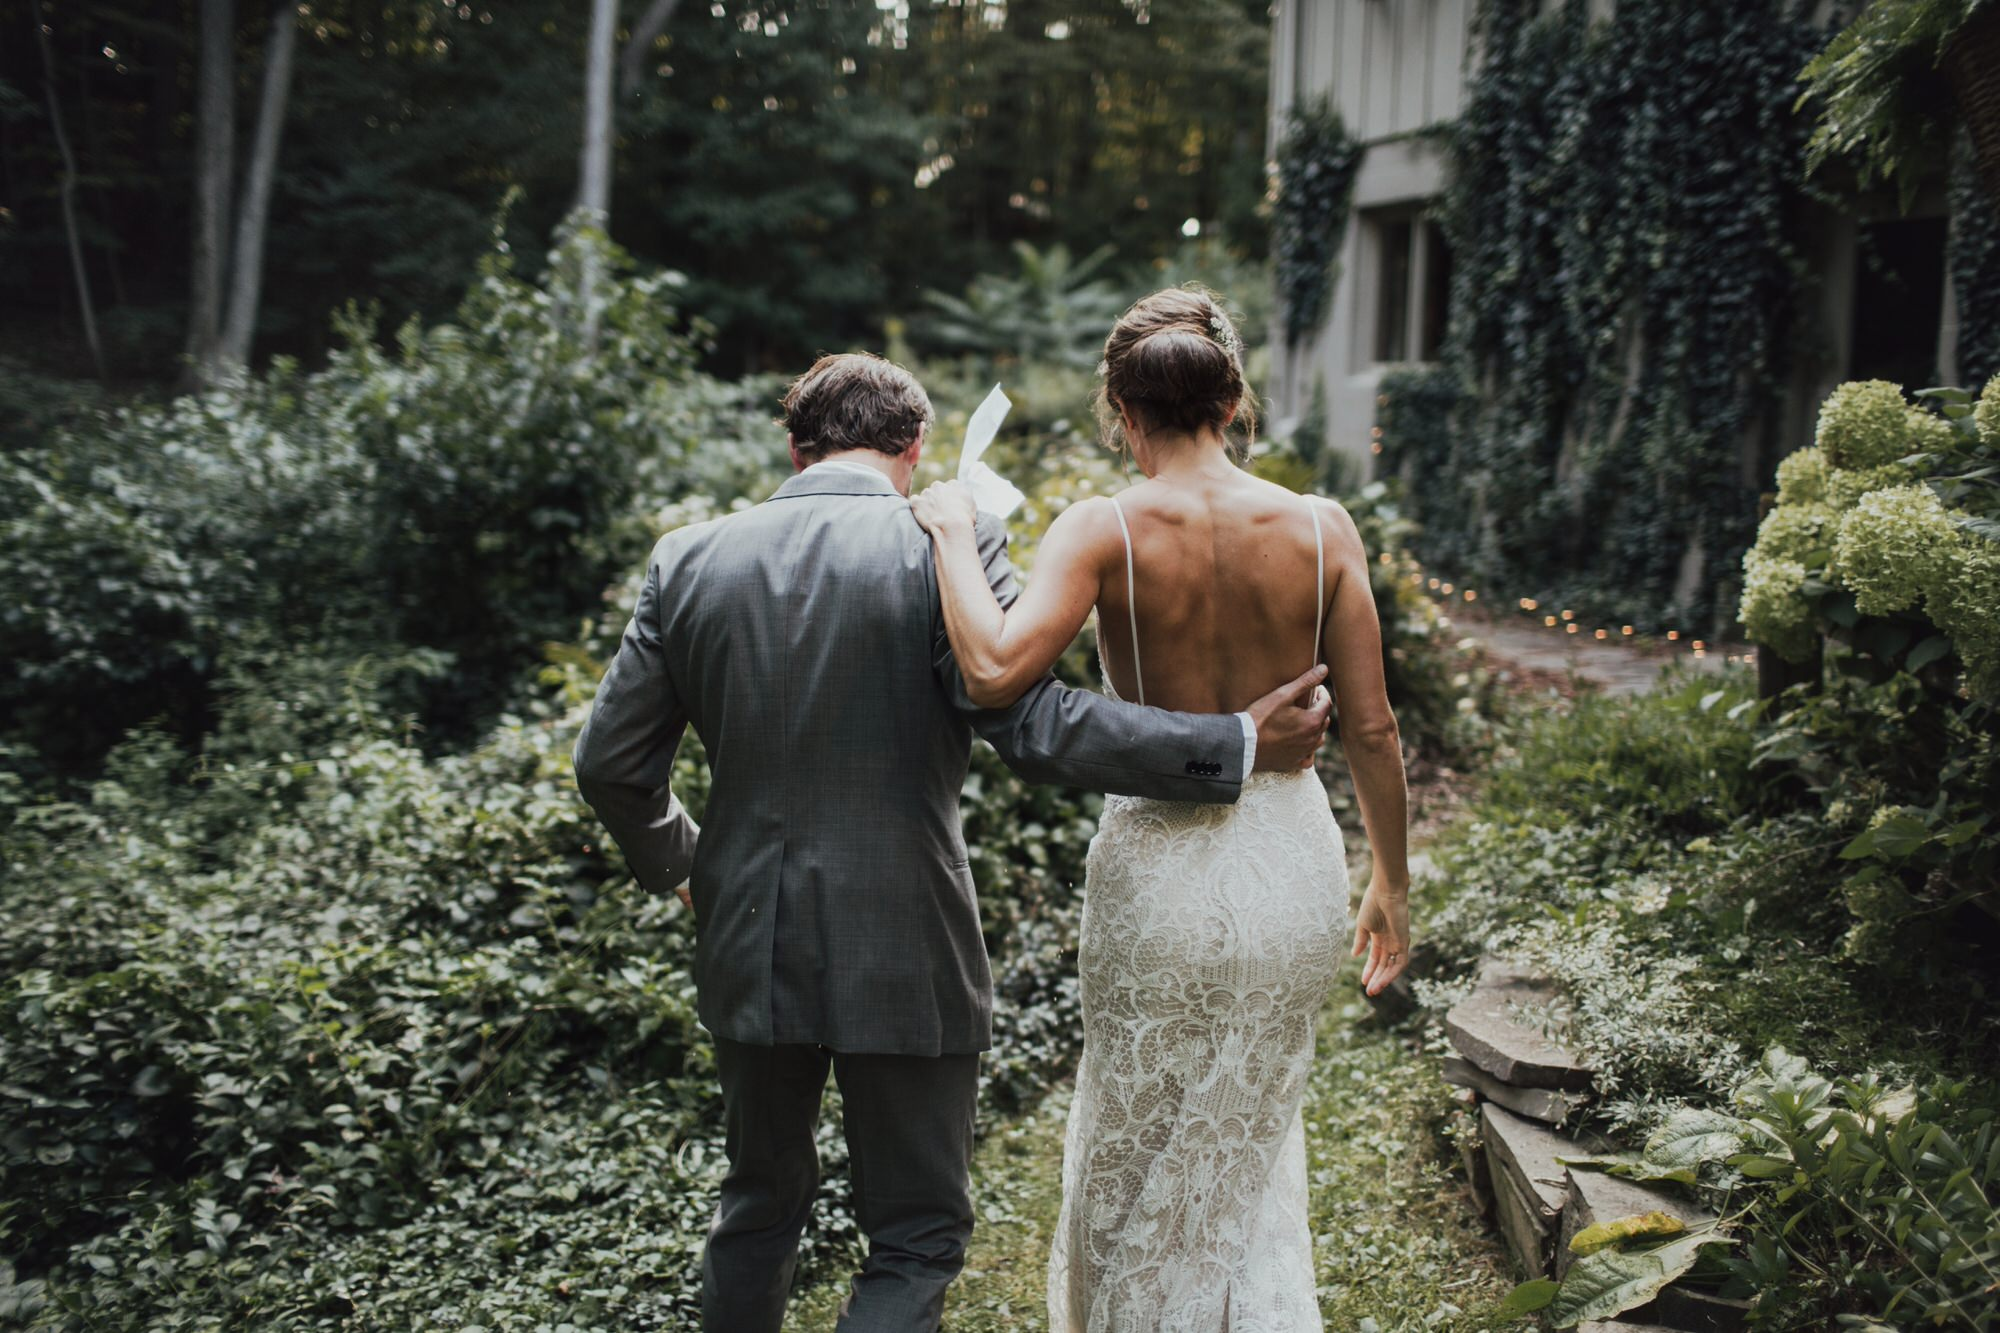 emily-aaron-rochester-new-york-wedding-photographer-79.JPG